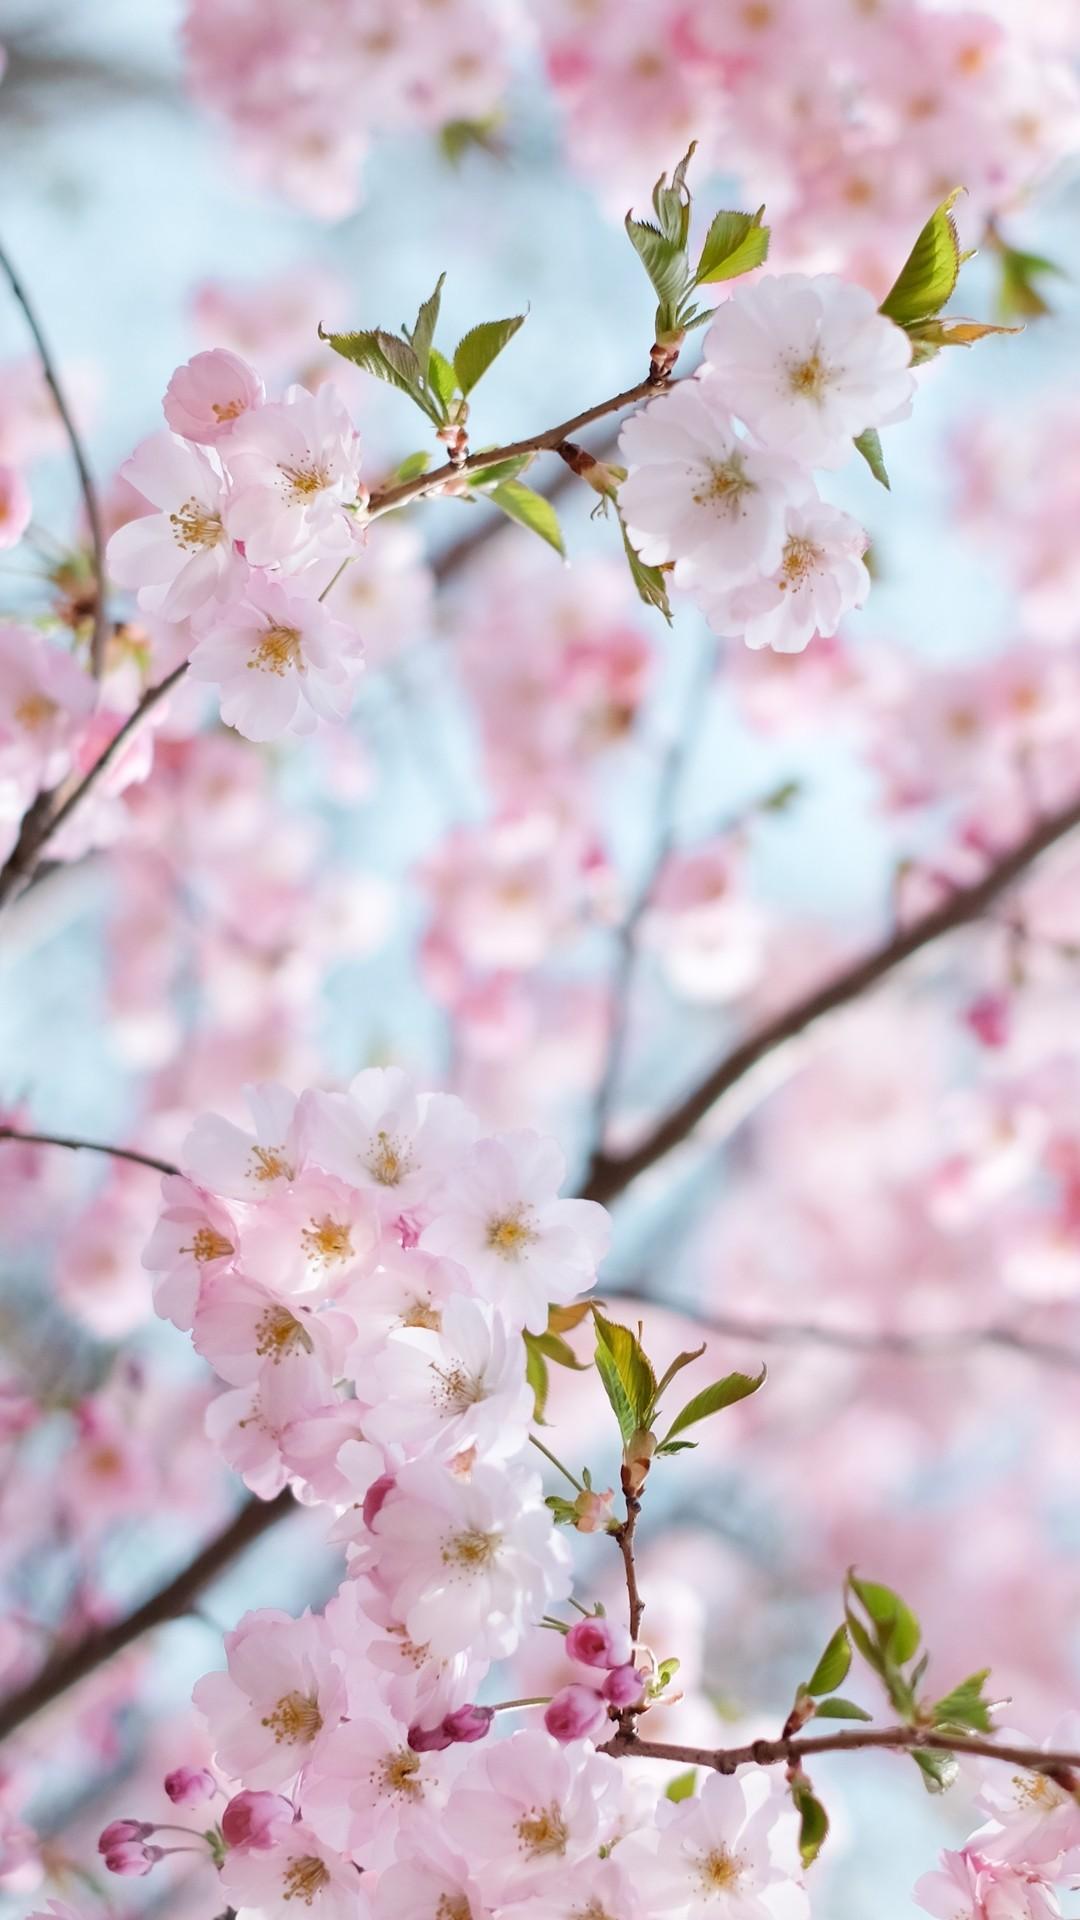 Cherry Blossom ios wallpaper